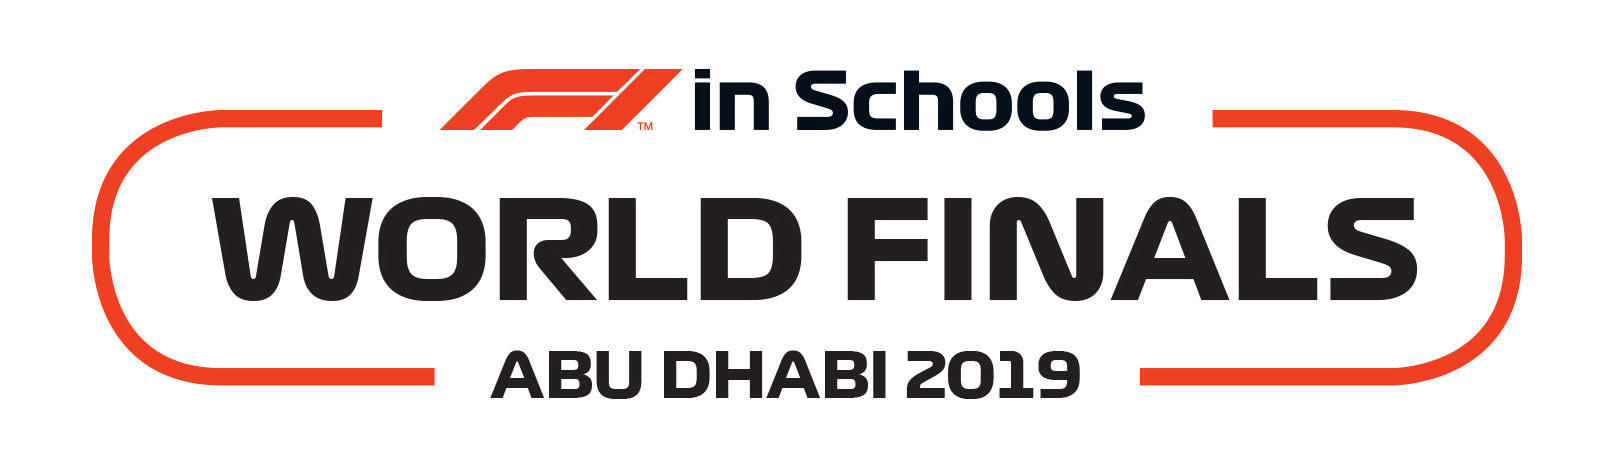 F1 in Schools World Finals 2019 Logo1.jpg